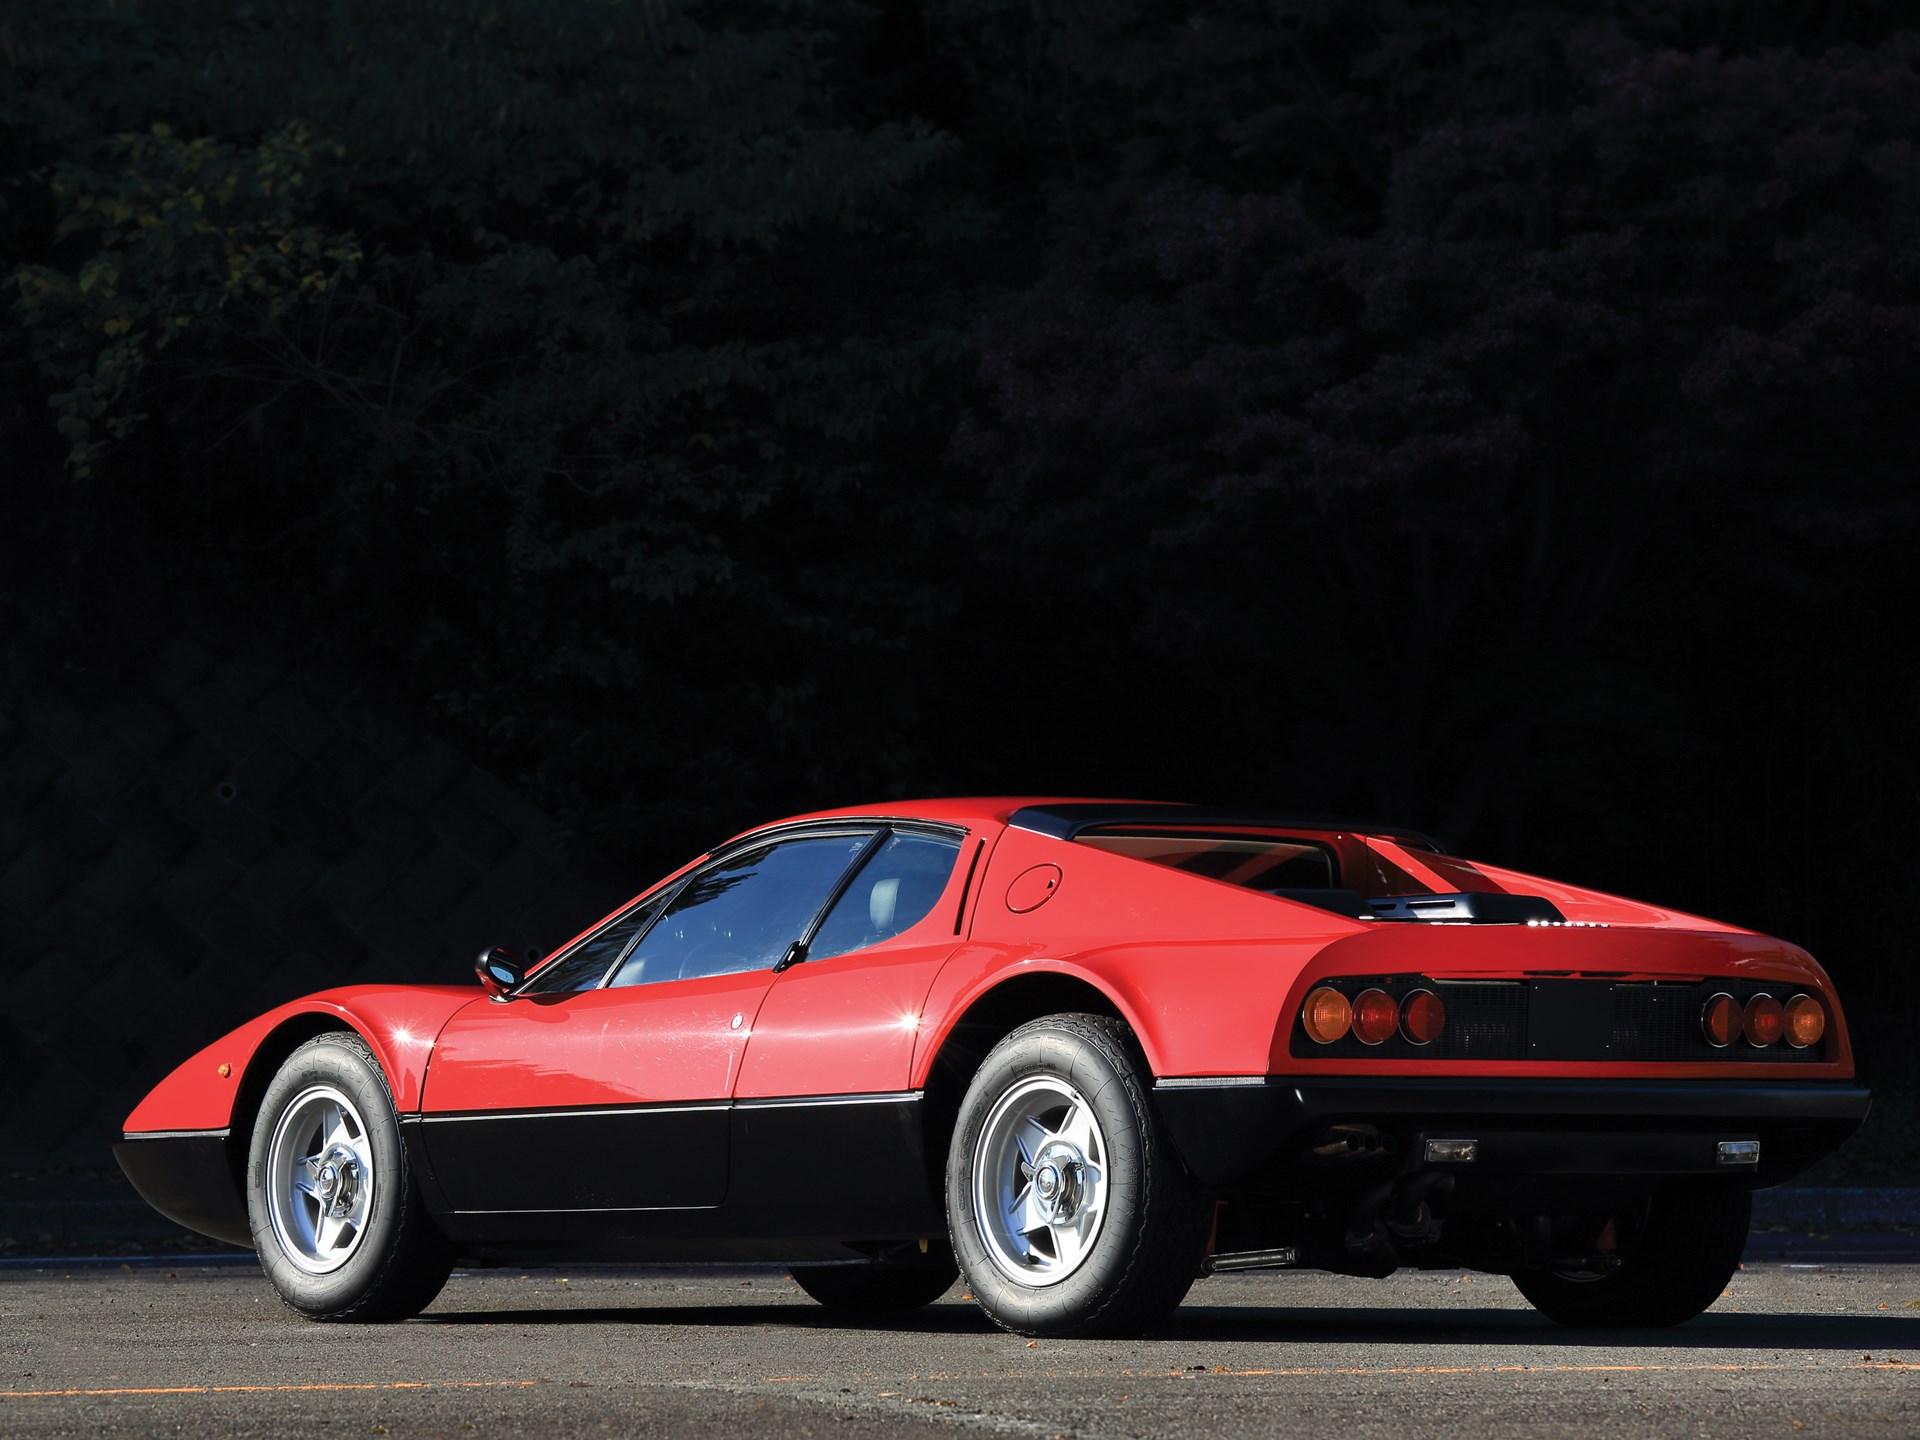 1974 Ferrari 365 GT4 BB by Scaglietti